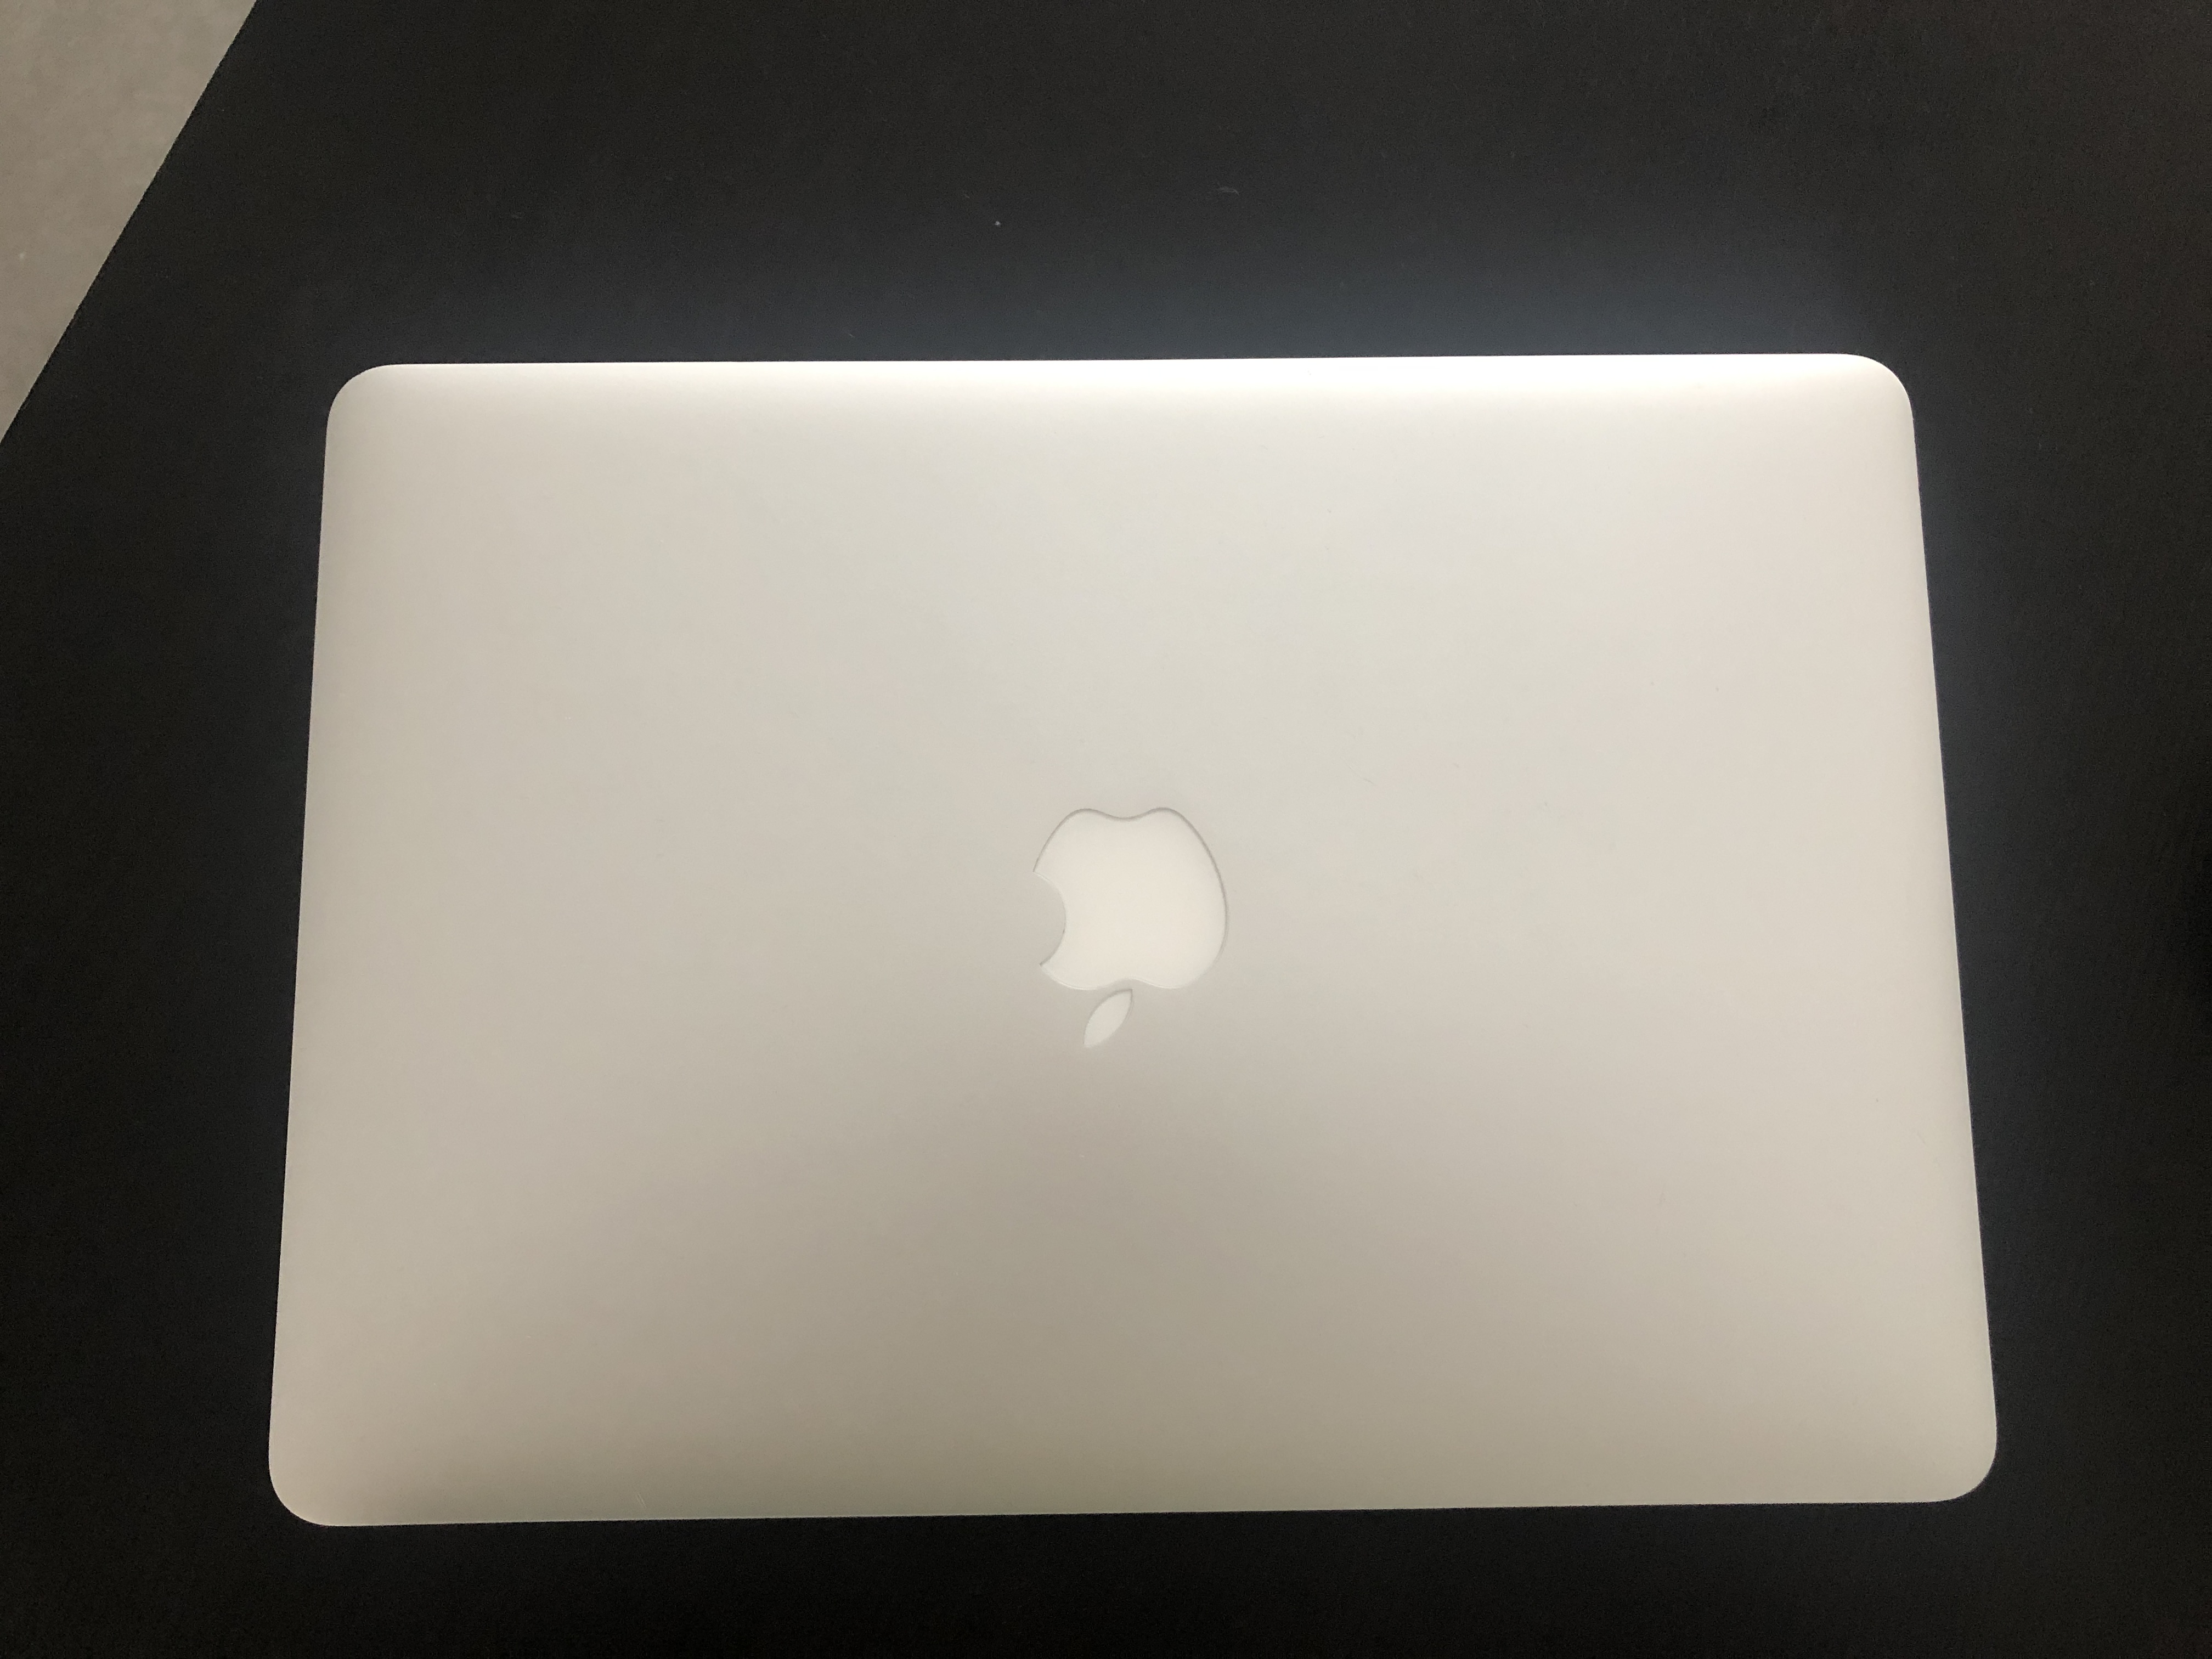 MacBook Air 13 2017 i5/ RAM 8GB/ 128 GB SSD Garant